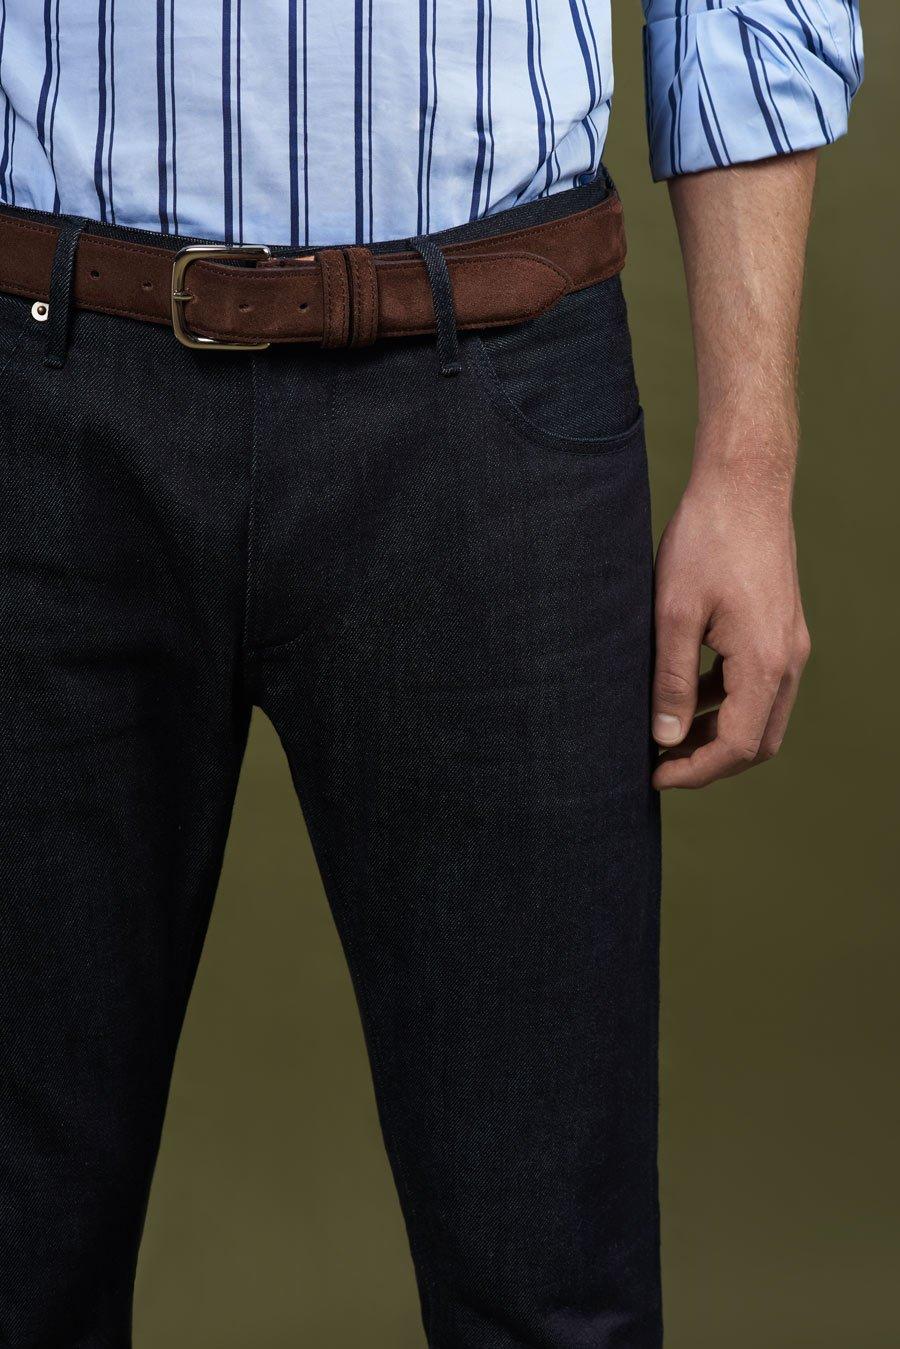 Spring Summer 2019 Lookbook Denim Jeans Stripe Shirt 01